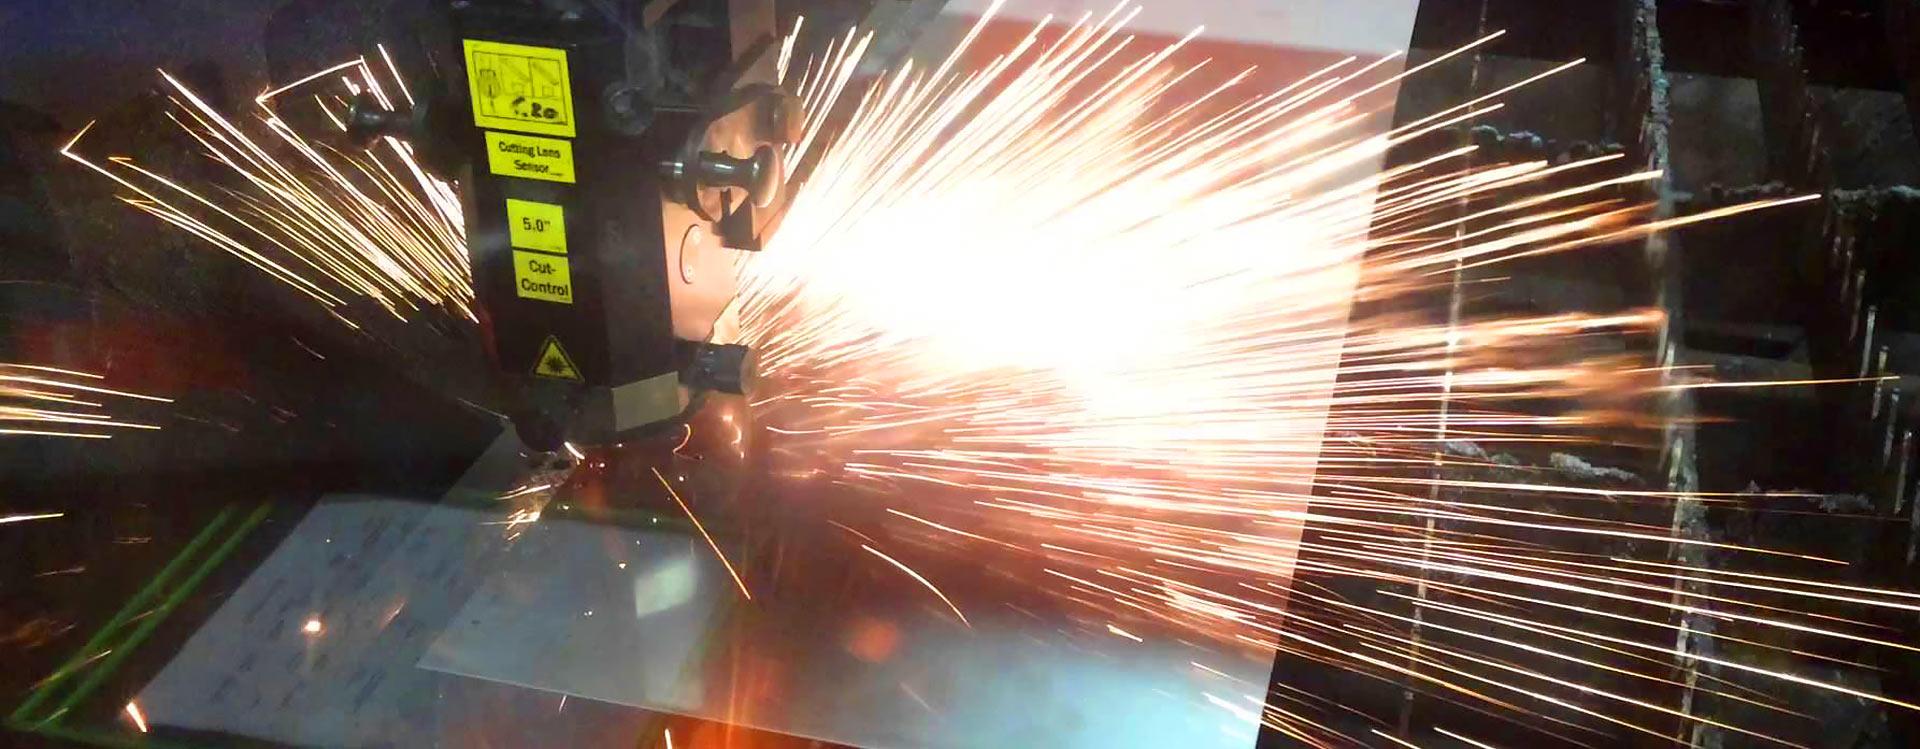 Sarholms mekanisk verkstad - Produktion